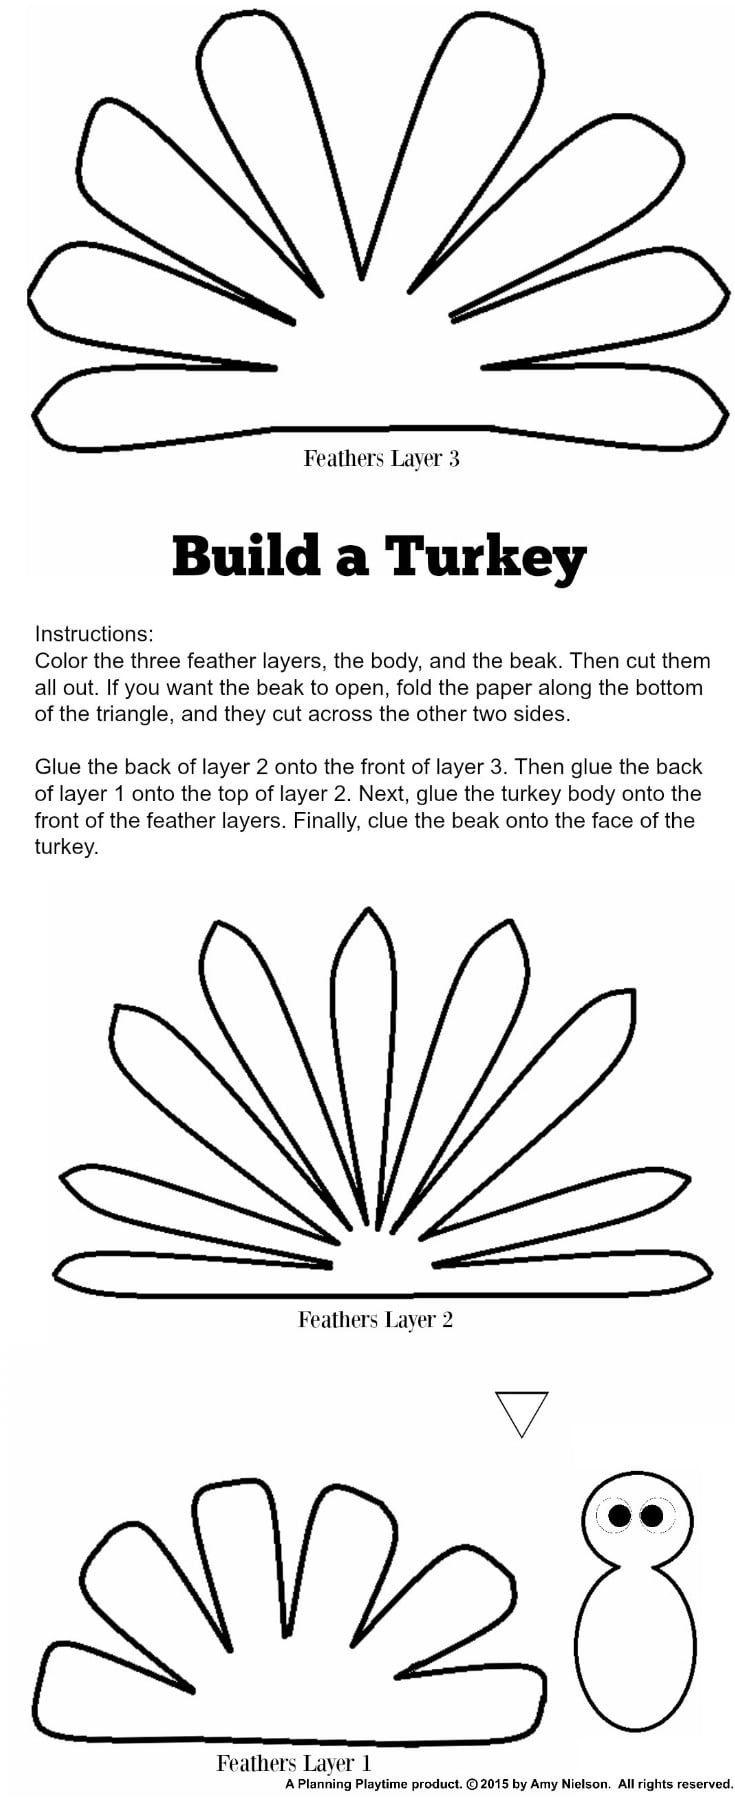 Cute Turkey Craft W/ Free Printable Template | Craft Ideas | Turkey - Free Printable Turkey Craft